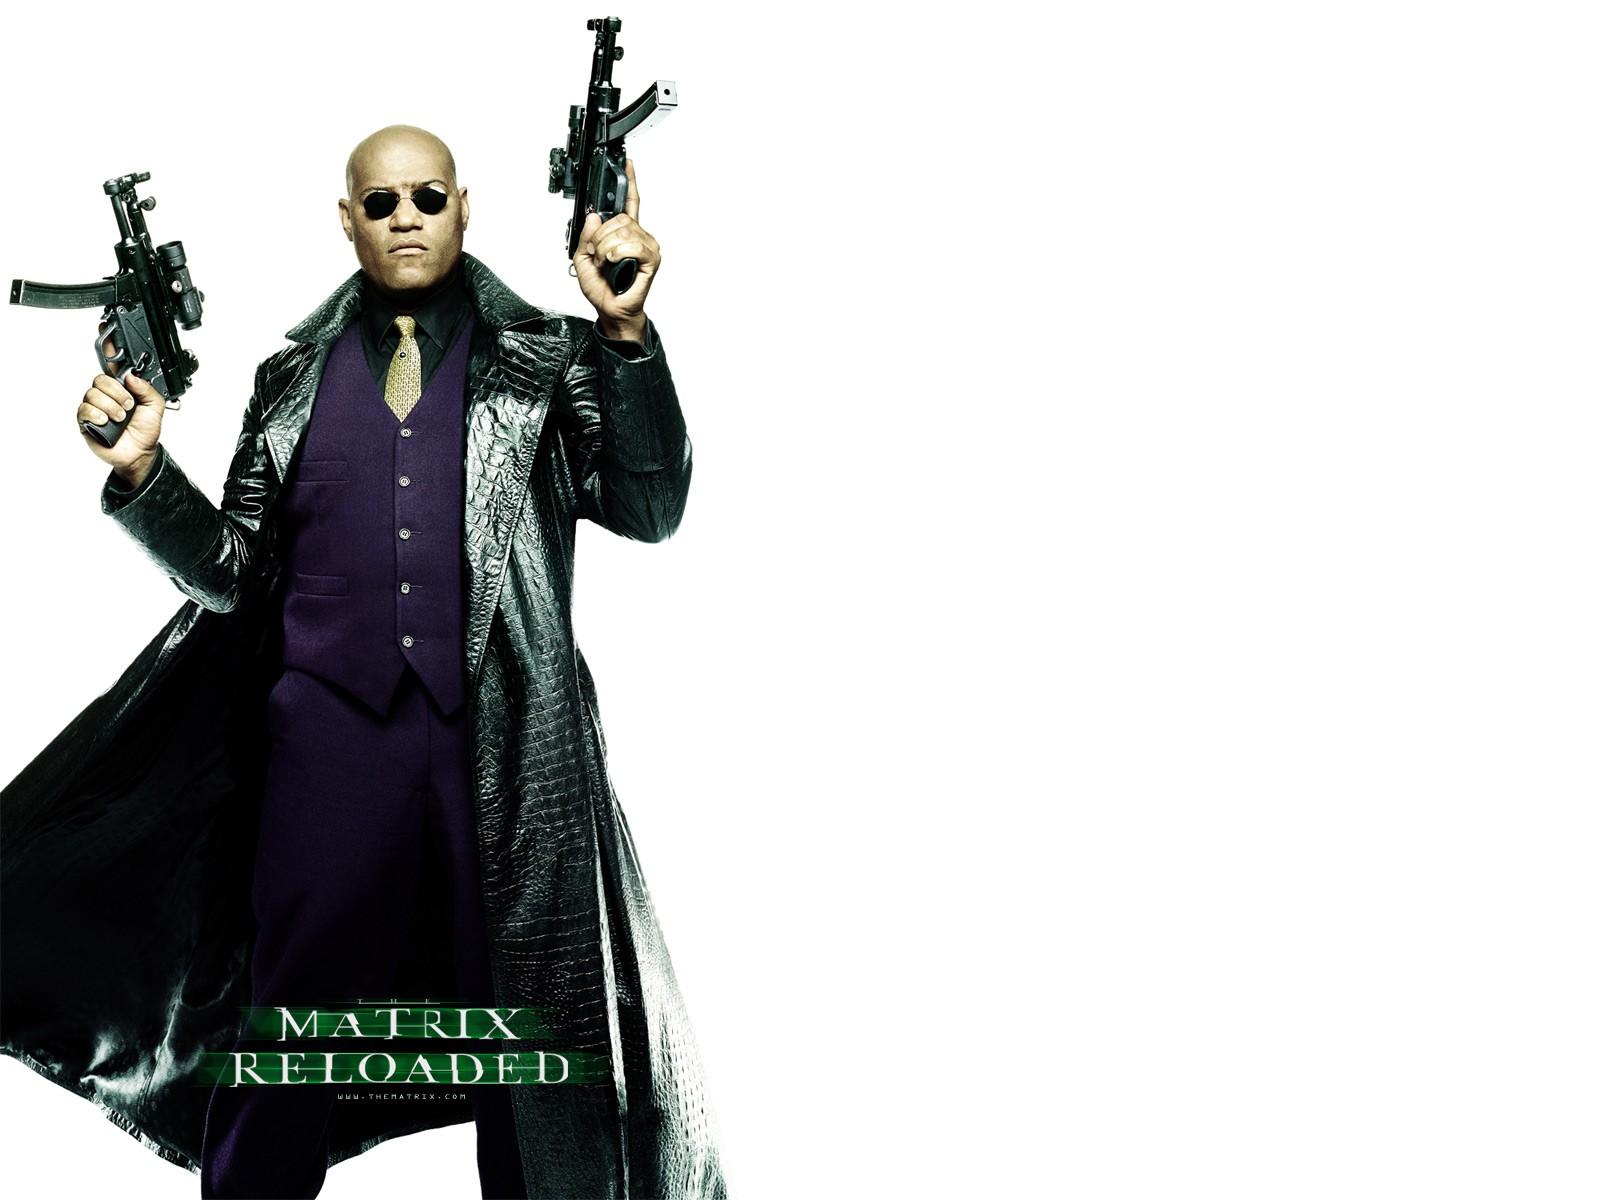 Wallpaper: Laurence Fishburne è Morpheus nel film 'Matrix Reloaded'